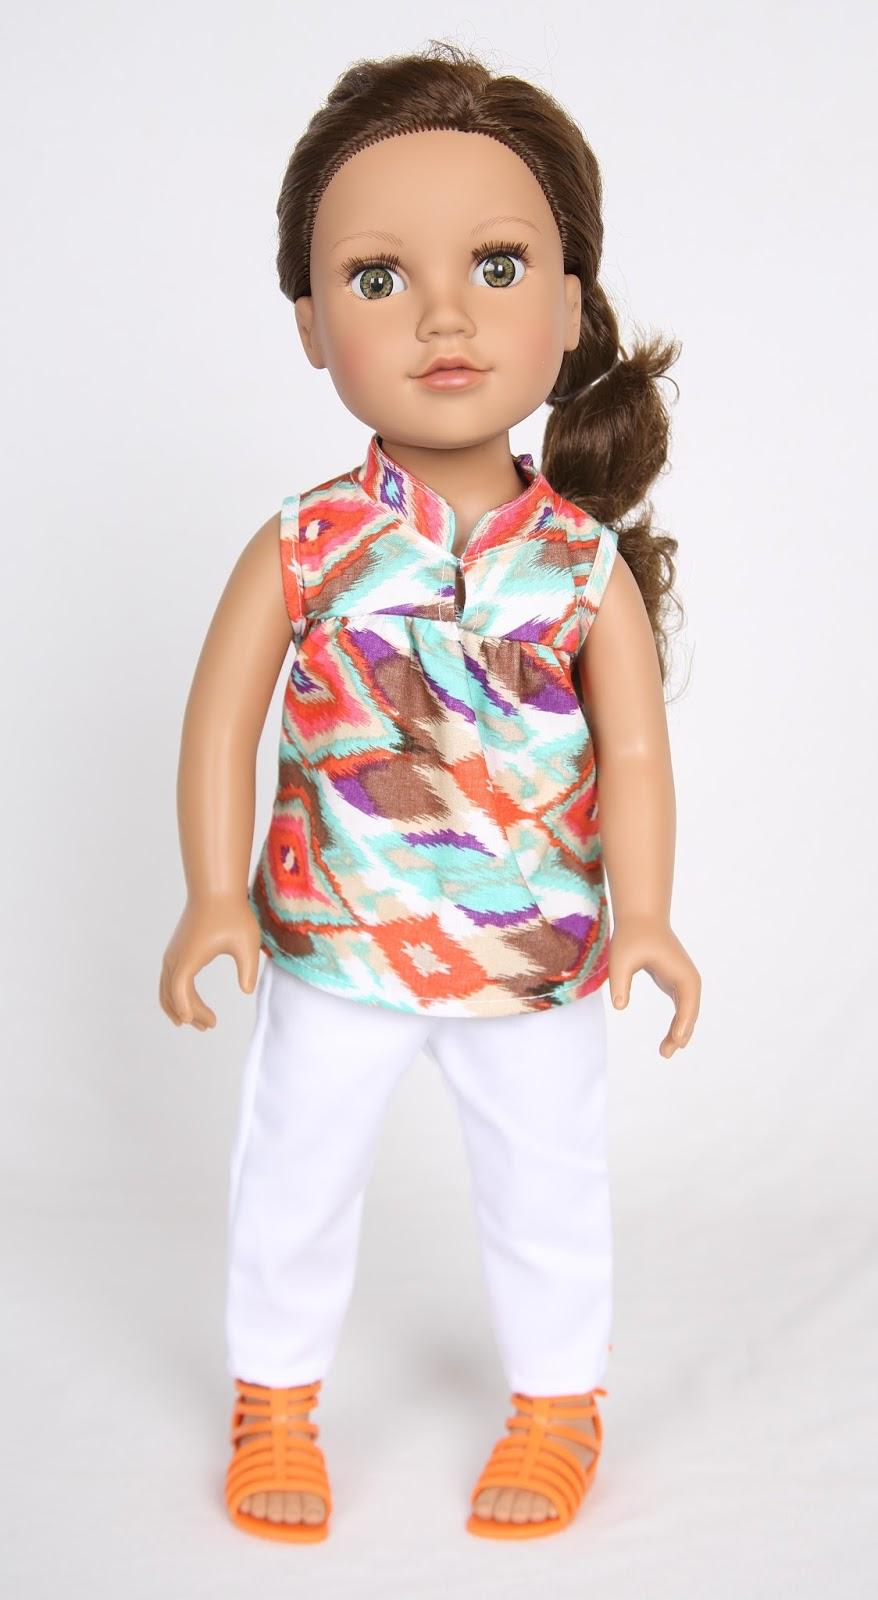 latin-teen-doll-girl